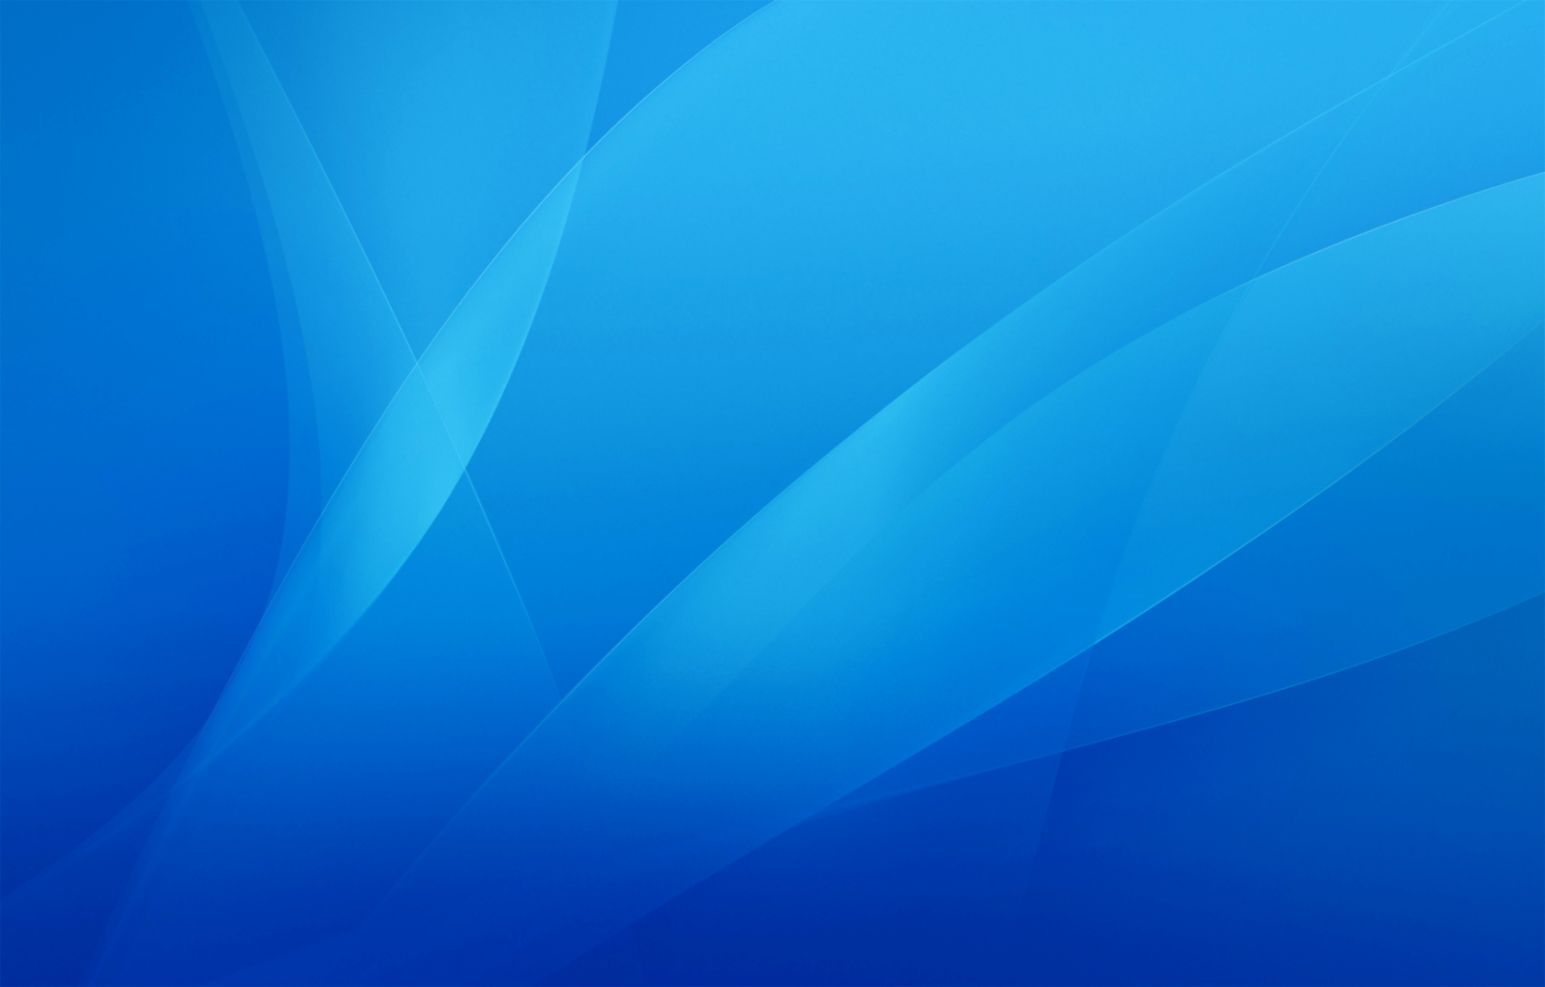 plain light blue pictures for desktop background best